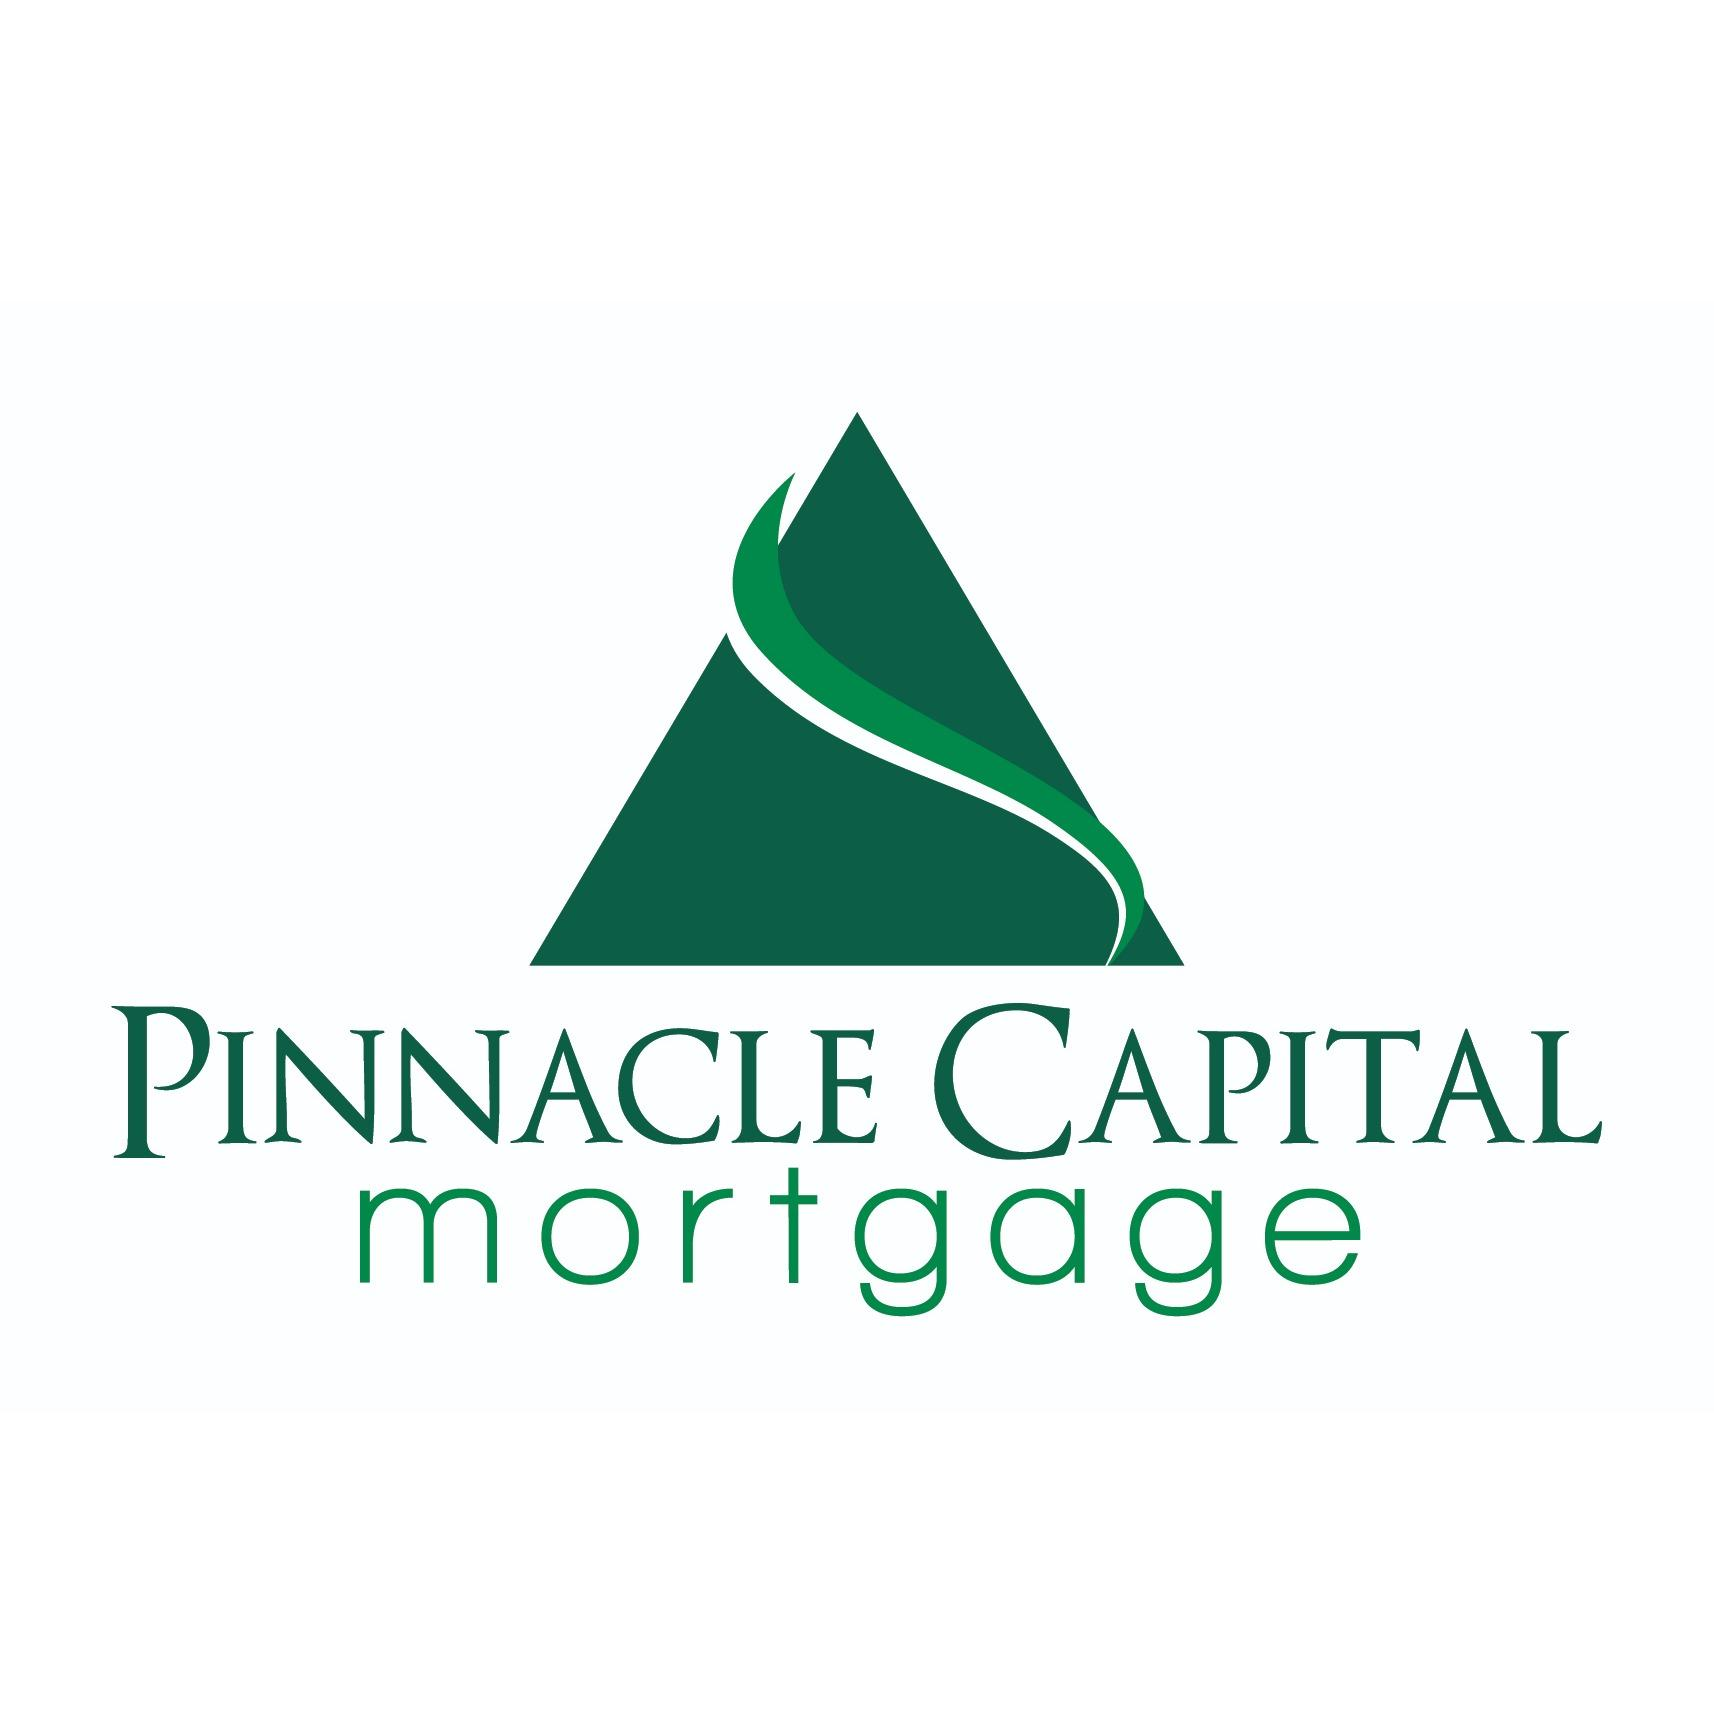 Dan Gould - Pinnacle Capital Mortgage